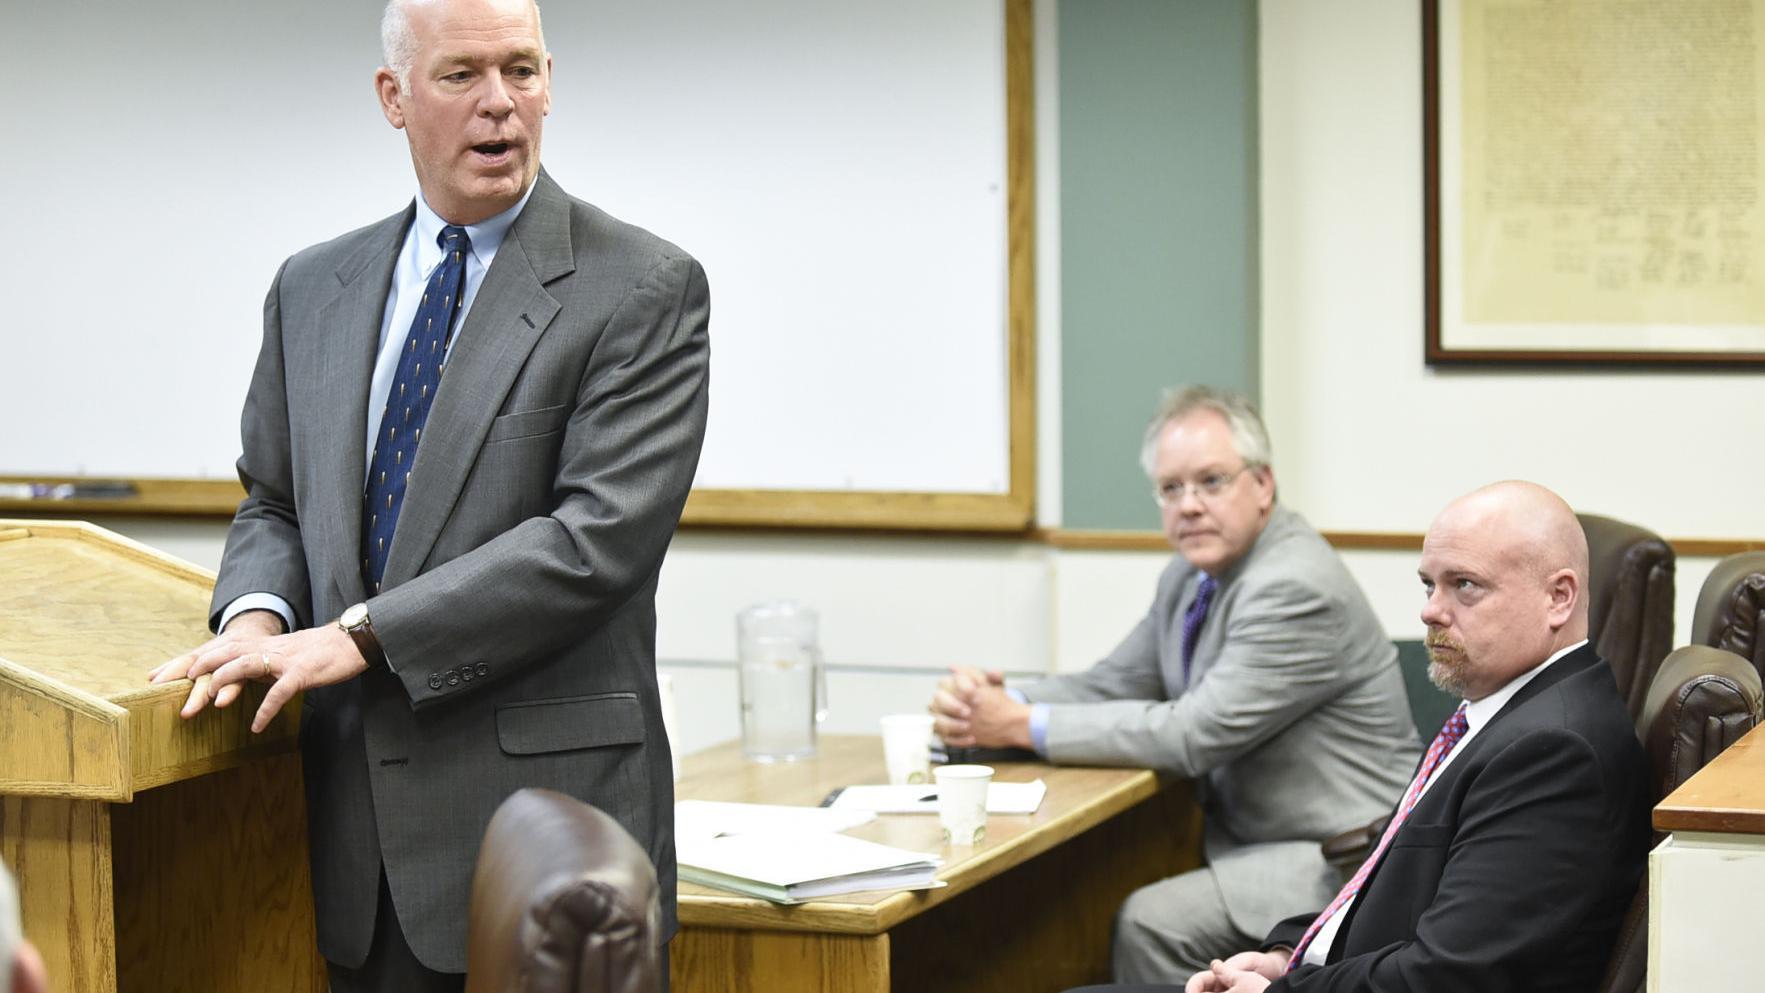 Montana Congressman Greg Gianforte misled investigators in assault case, documents say